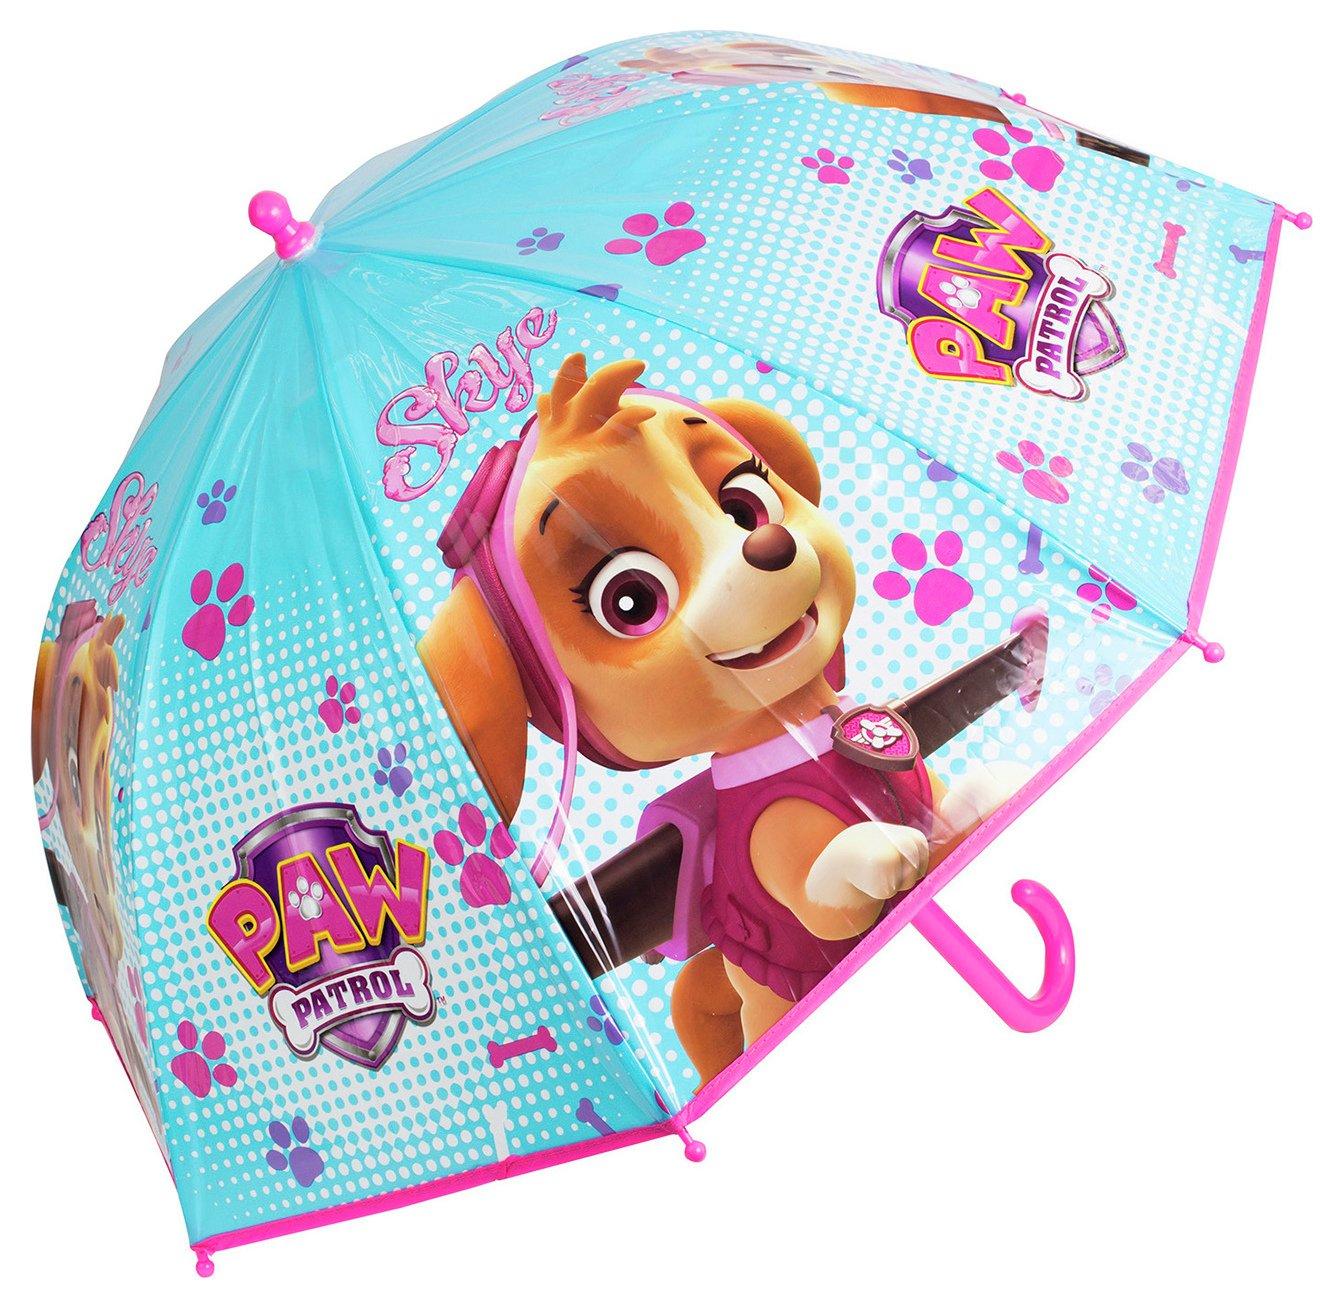 Image of Paw Patrol Bubble Umbrella.